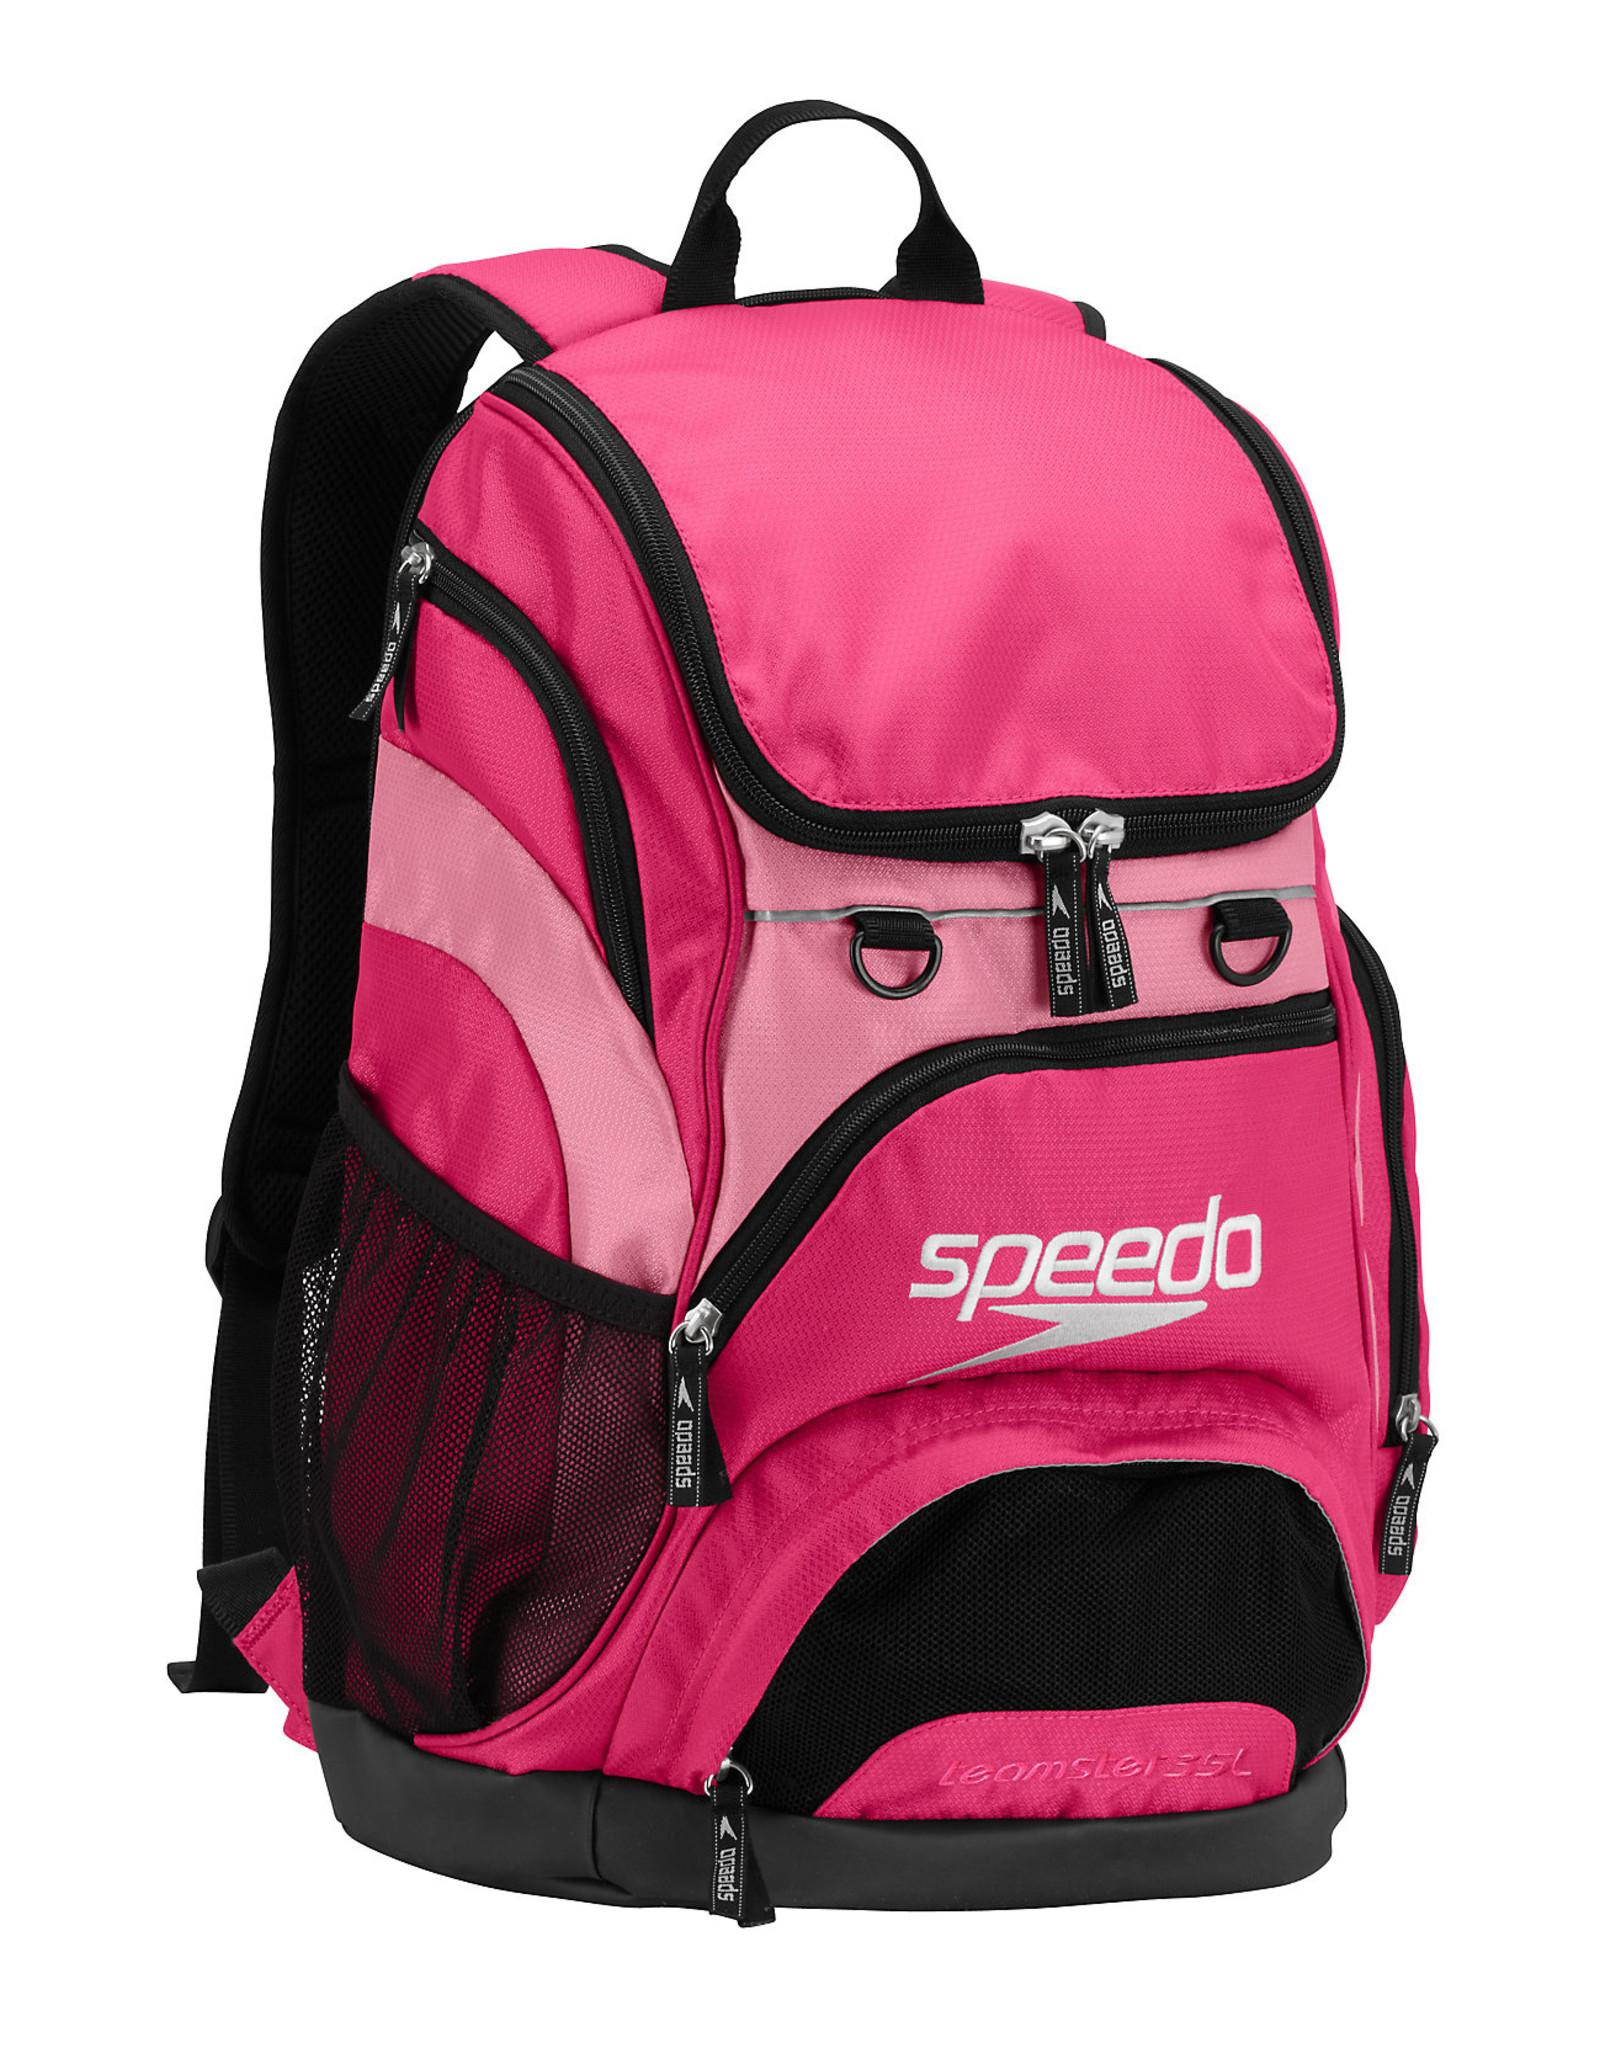 SPEEDO SPEEDO TEAMSTER BACKPACK